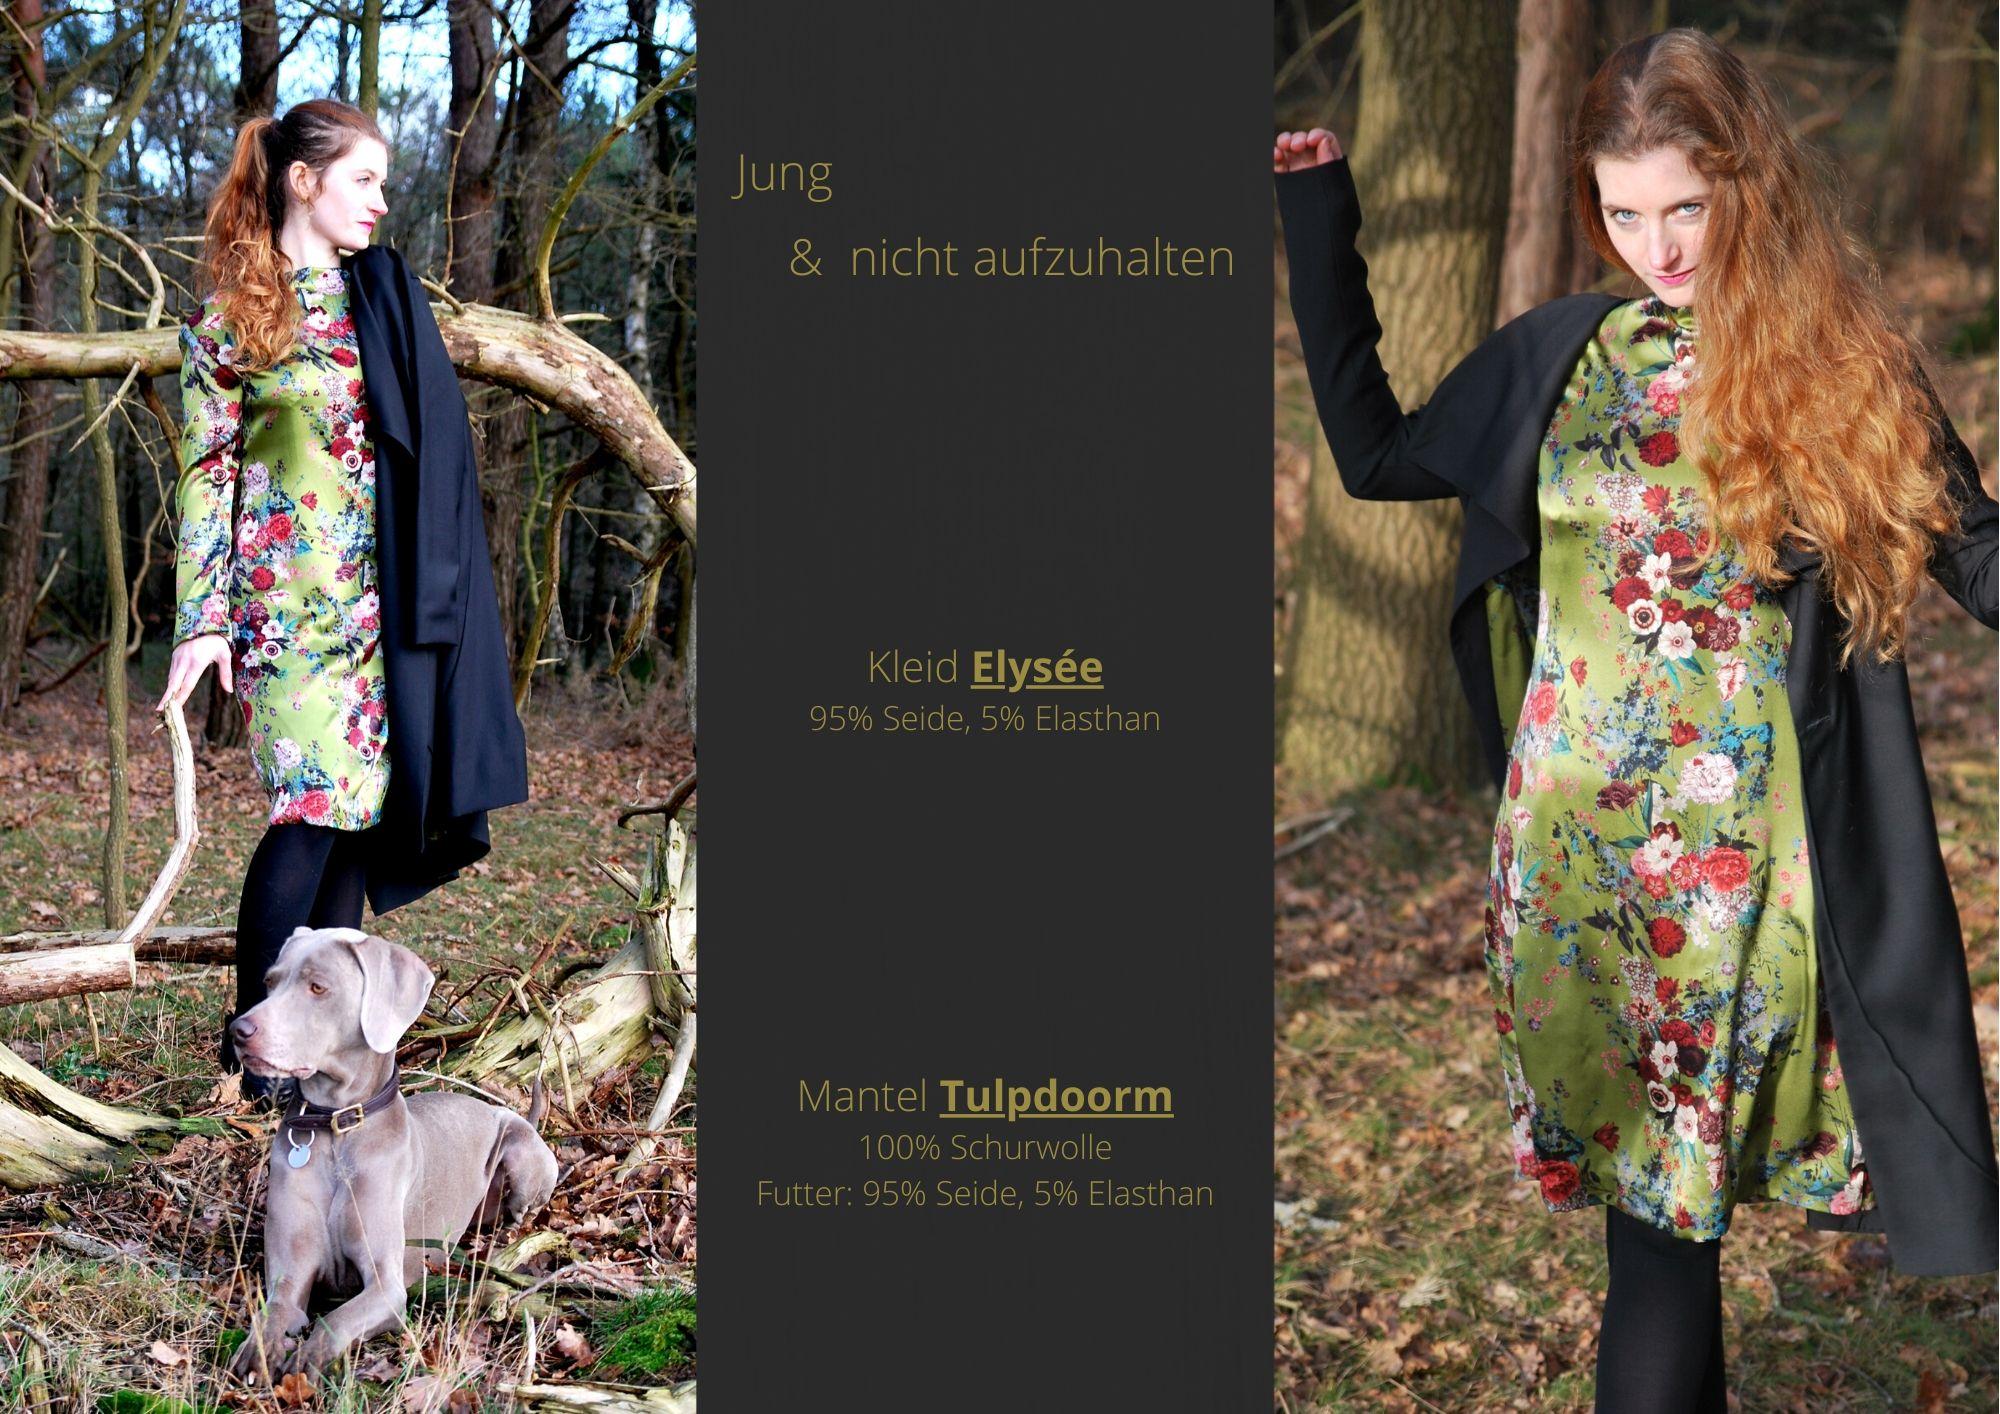 Herbst & Winterkollektion 2020/21 Seite 3